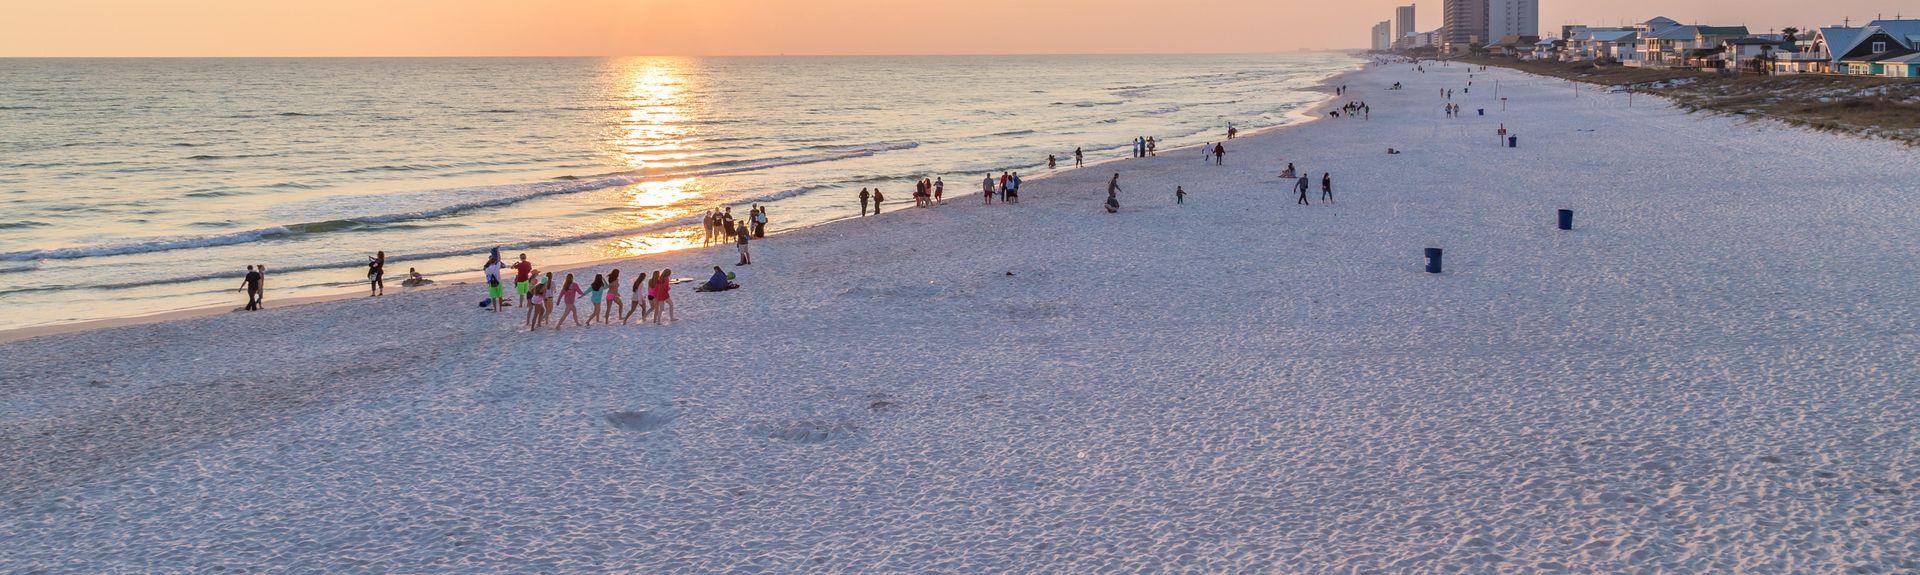 Laguna Beach, Panama City Beach, Florida, United States of America